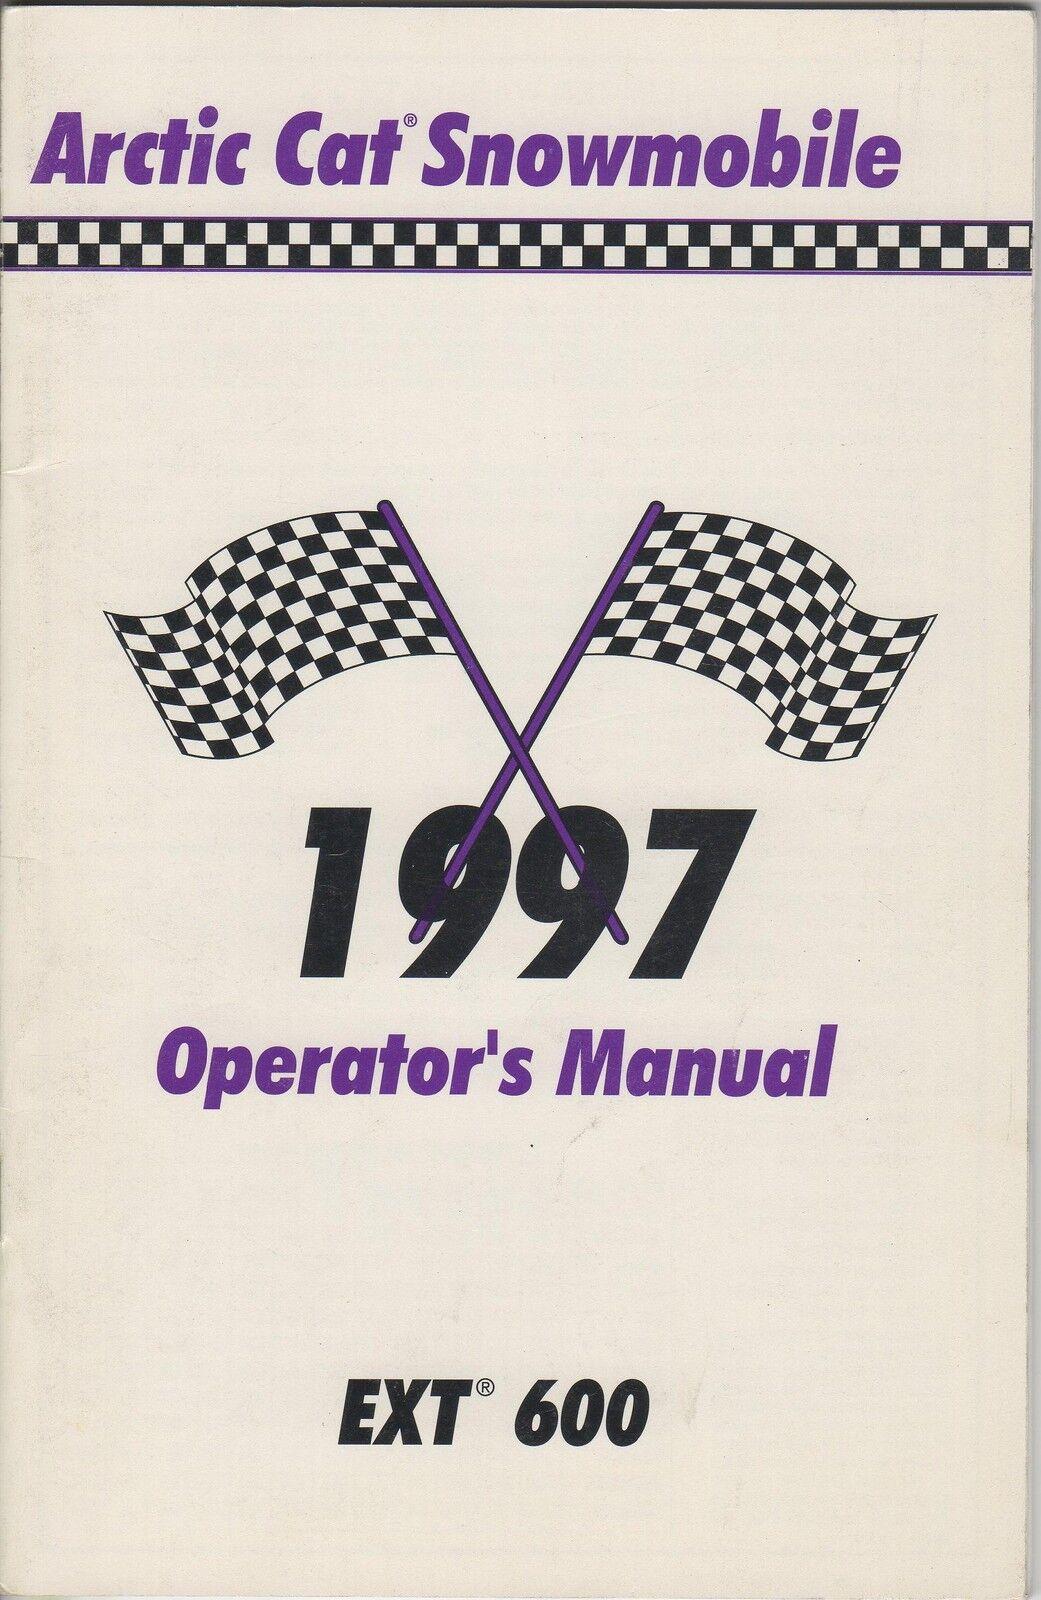 1997 ARCTIC CAT SNOWMOBILE EXT 600 OPERATOR  MANUAL